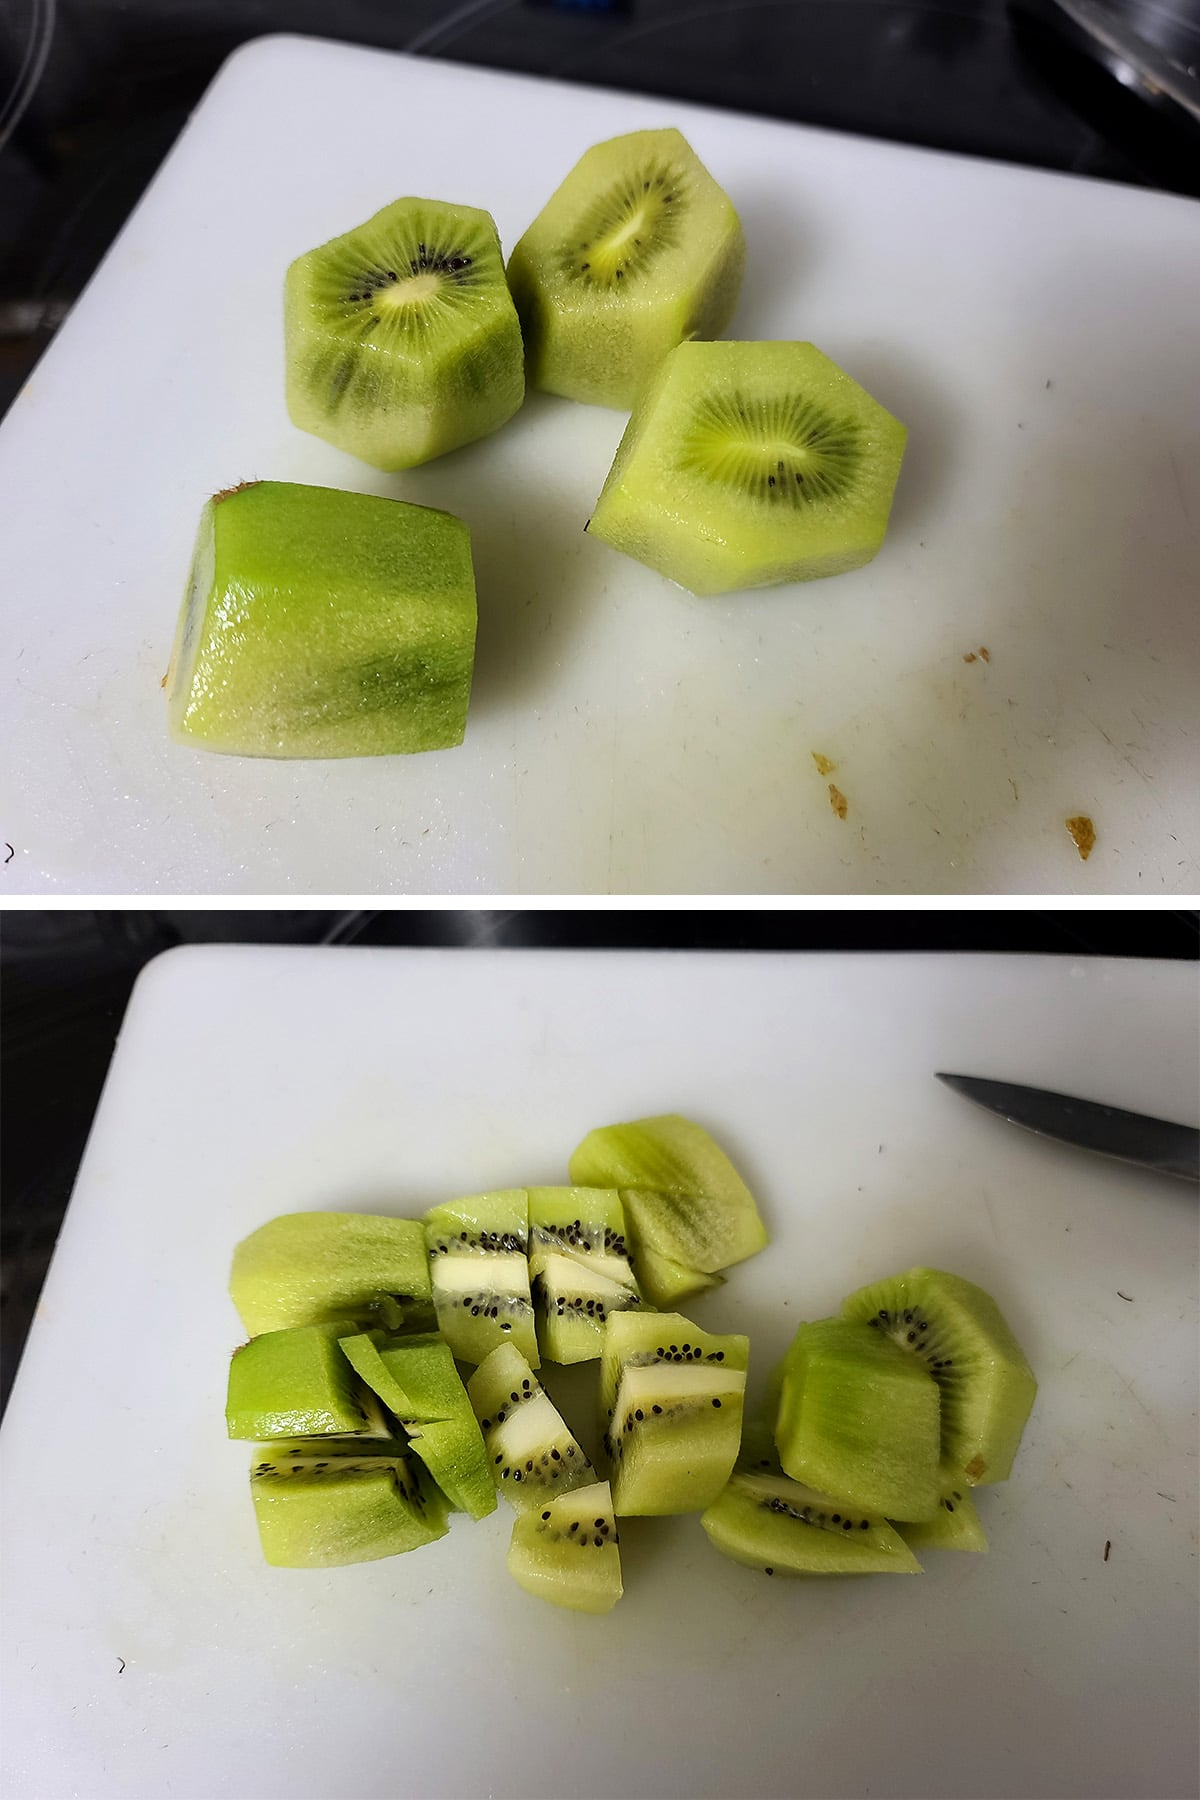 Peeled kiwis being chopped on a white cutting board.